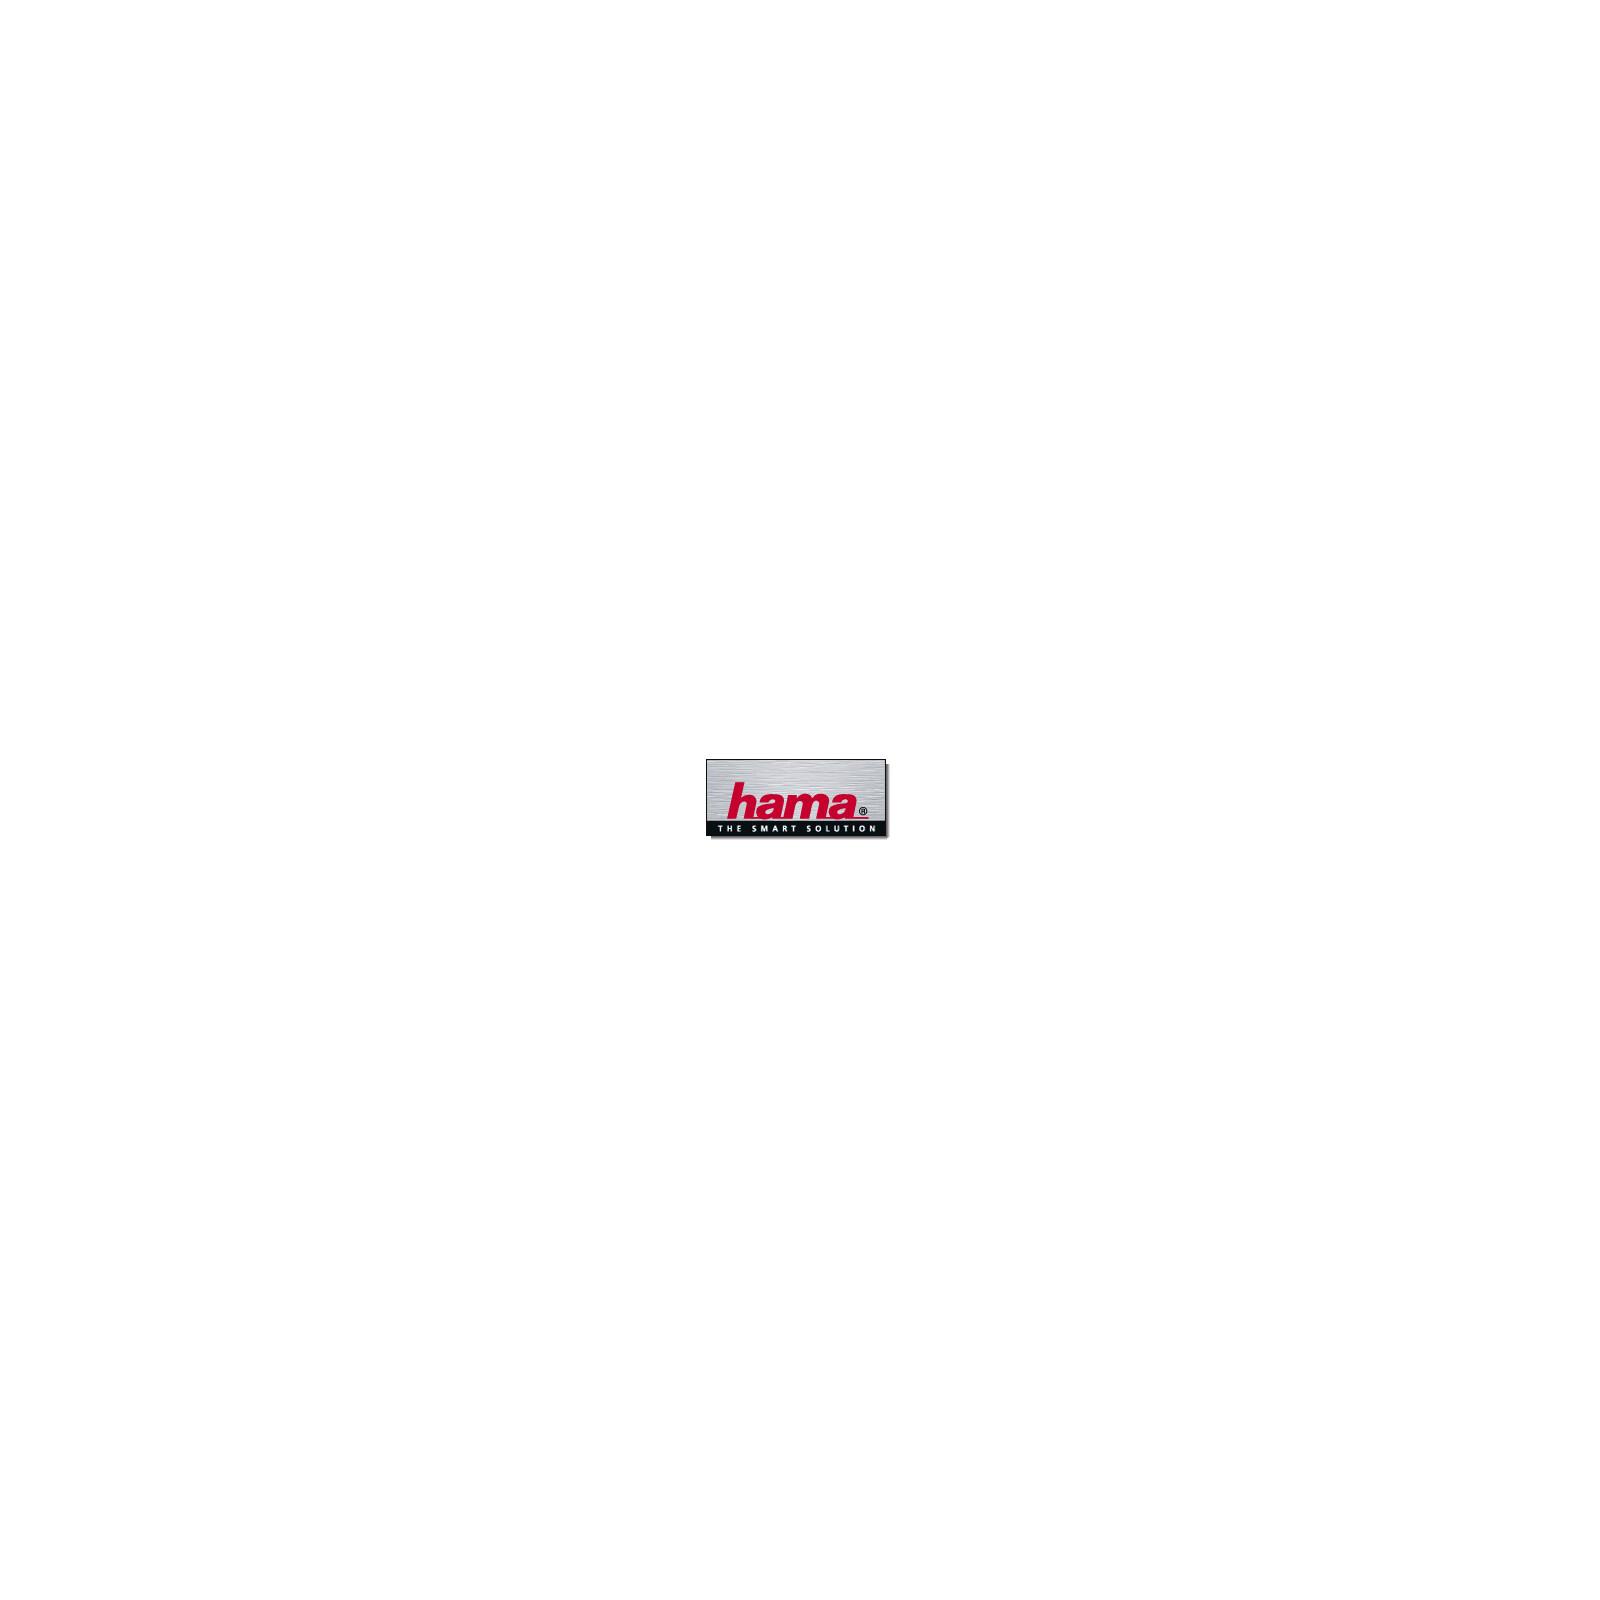 Hama 78400 Hama USB-2.0-Verlängerungskabel 5m